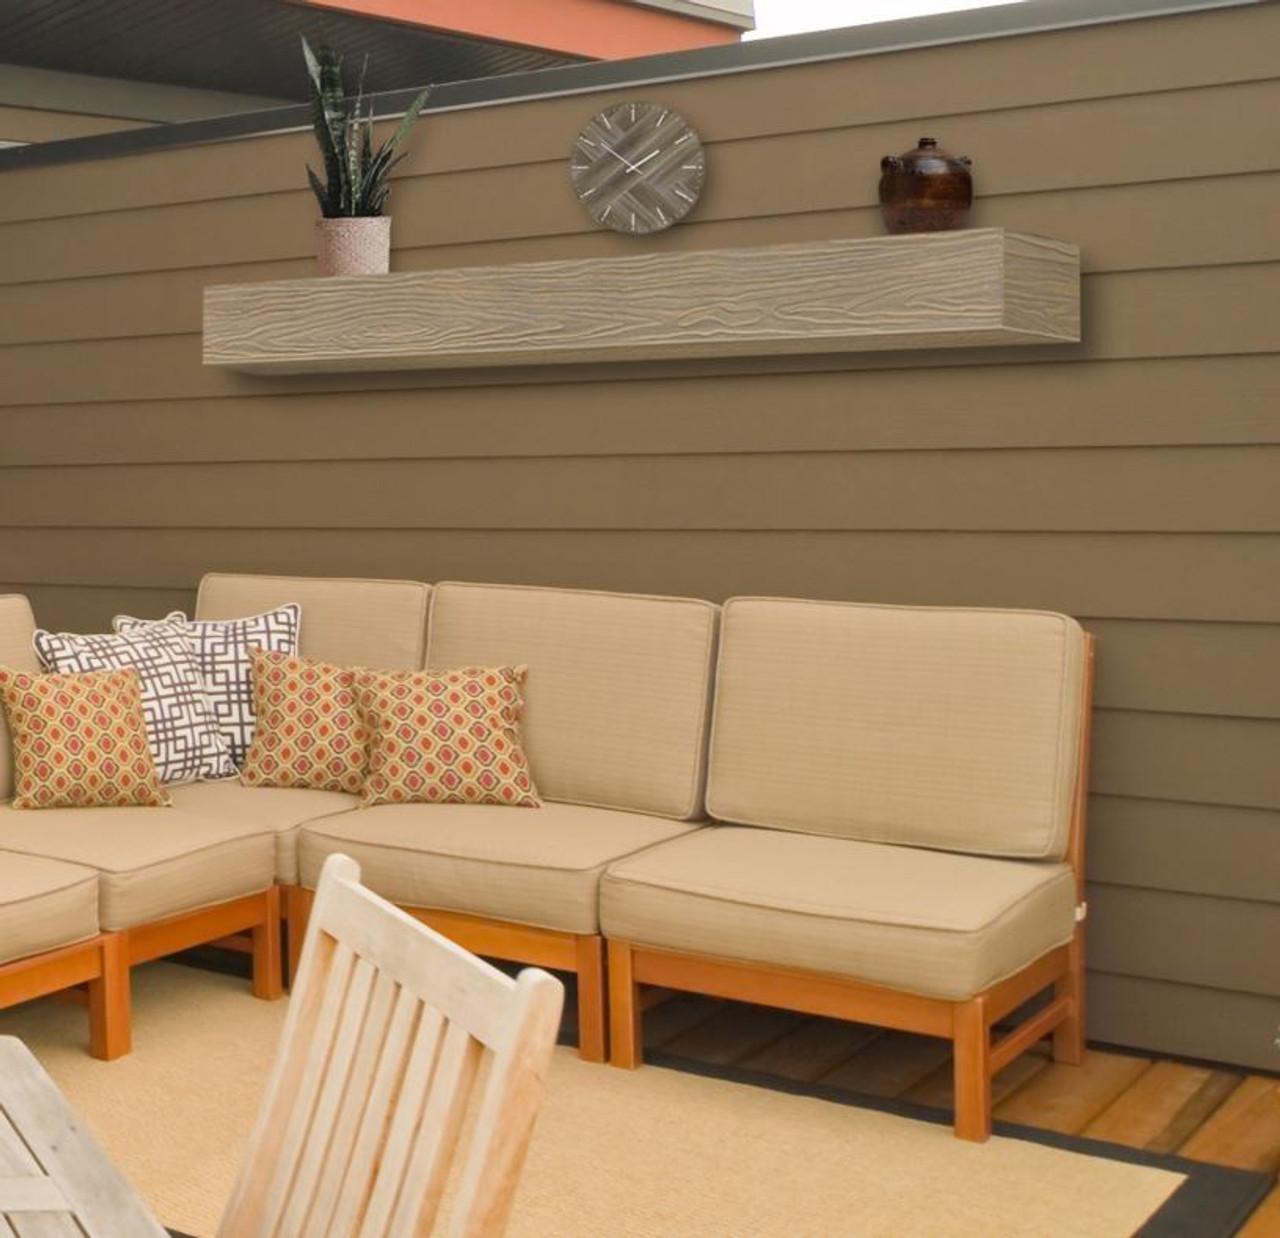 Fontana NC Mantel Shelf Lifestyle View 1